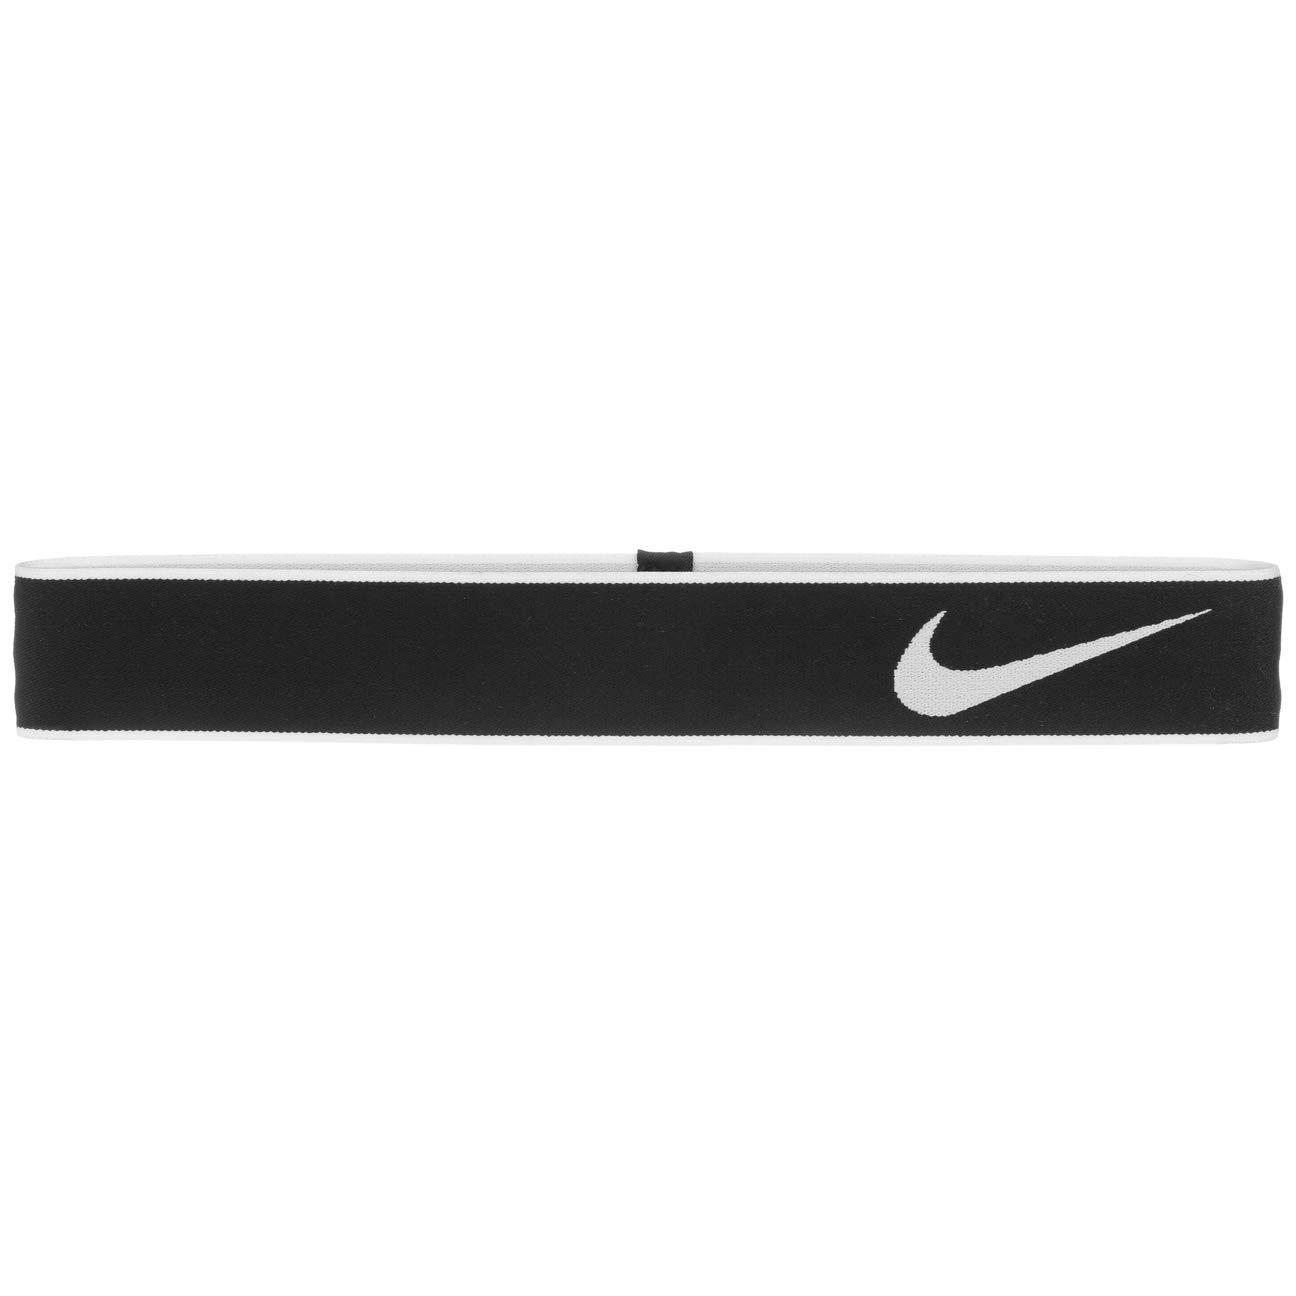 Nike Pro Swoosh Headband 2.0 Stirnband Stirnw/ärmer Schwei/ßband Haarband